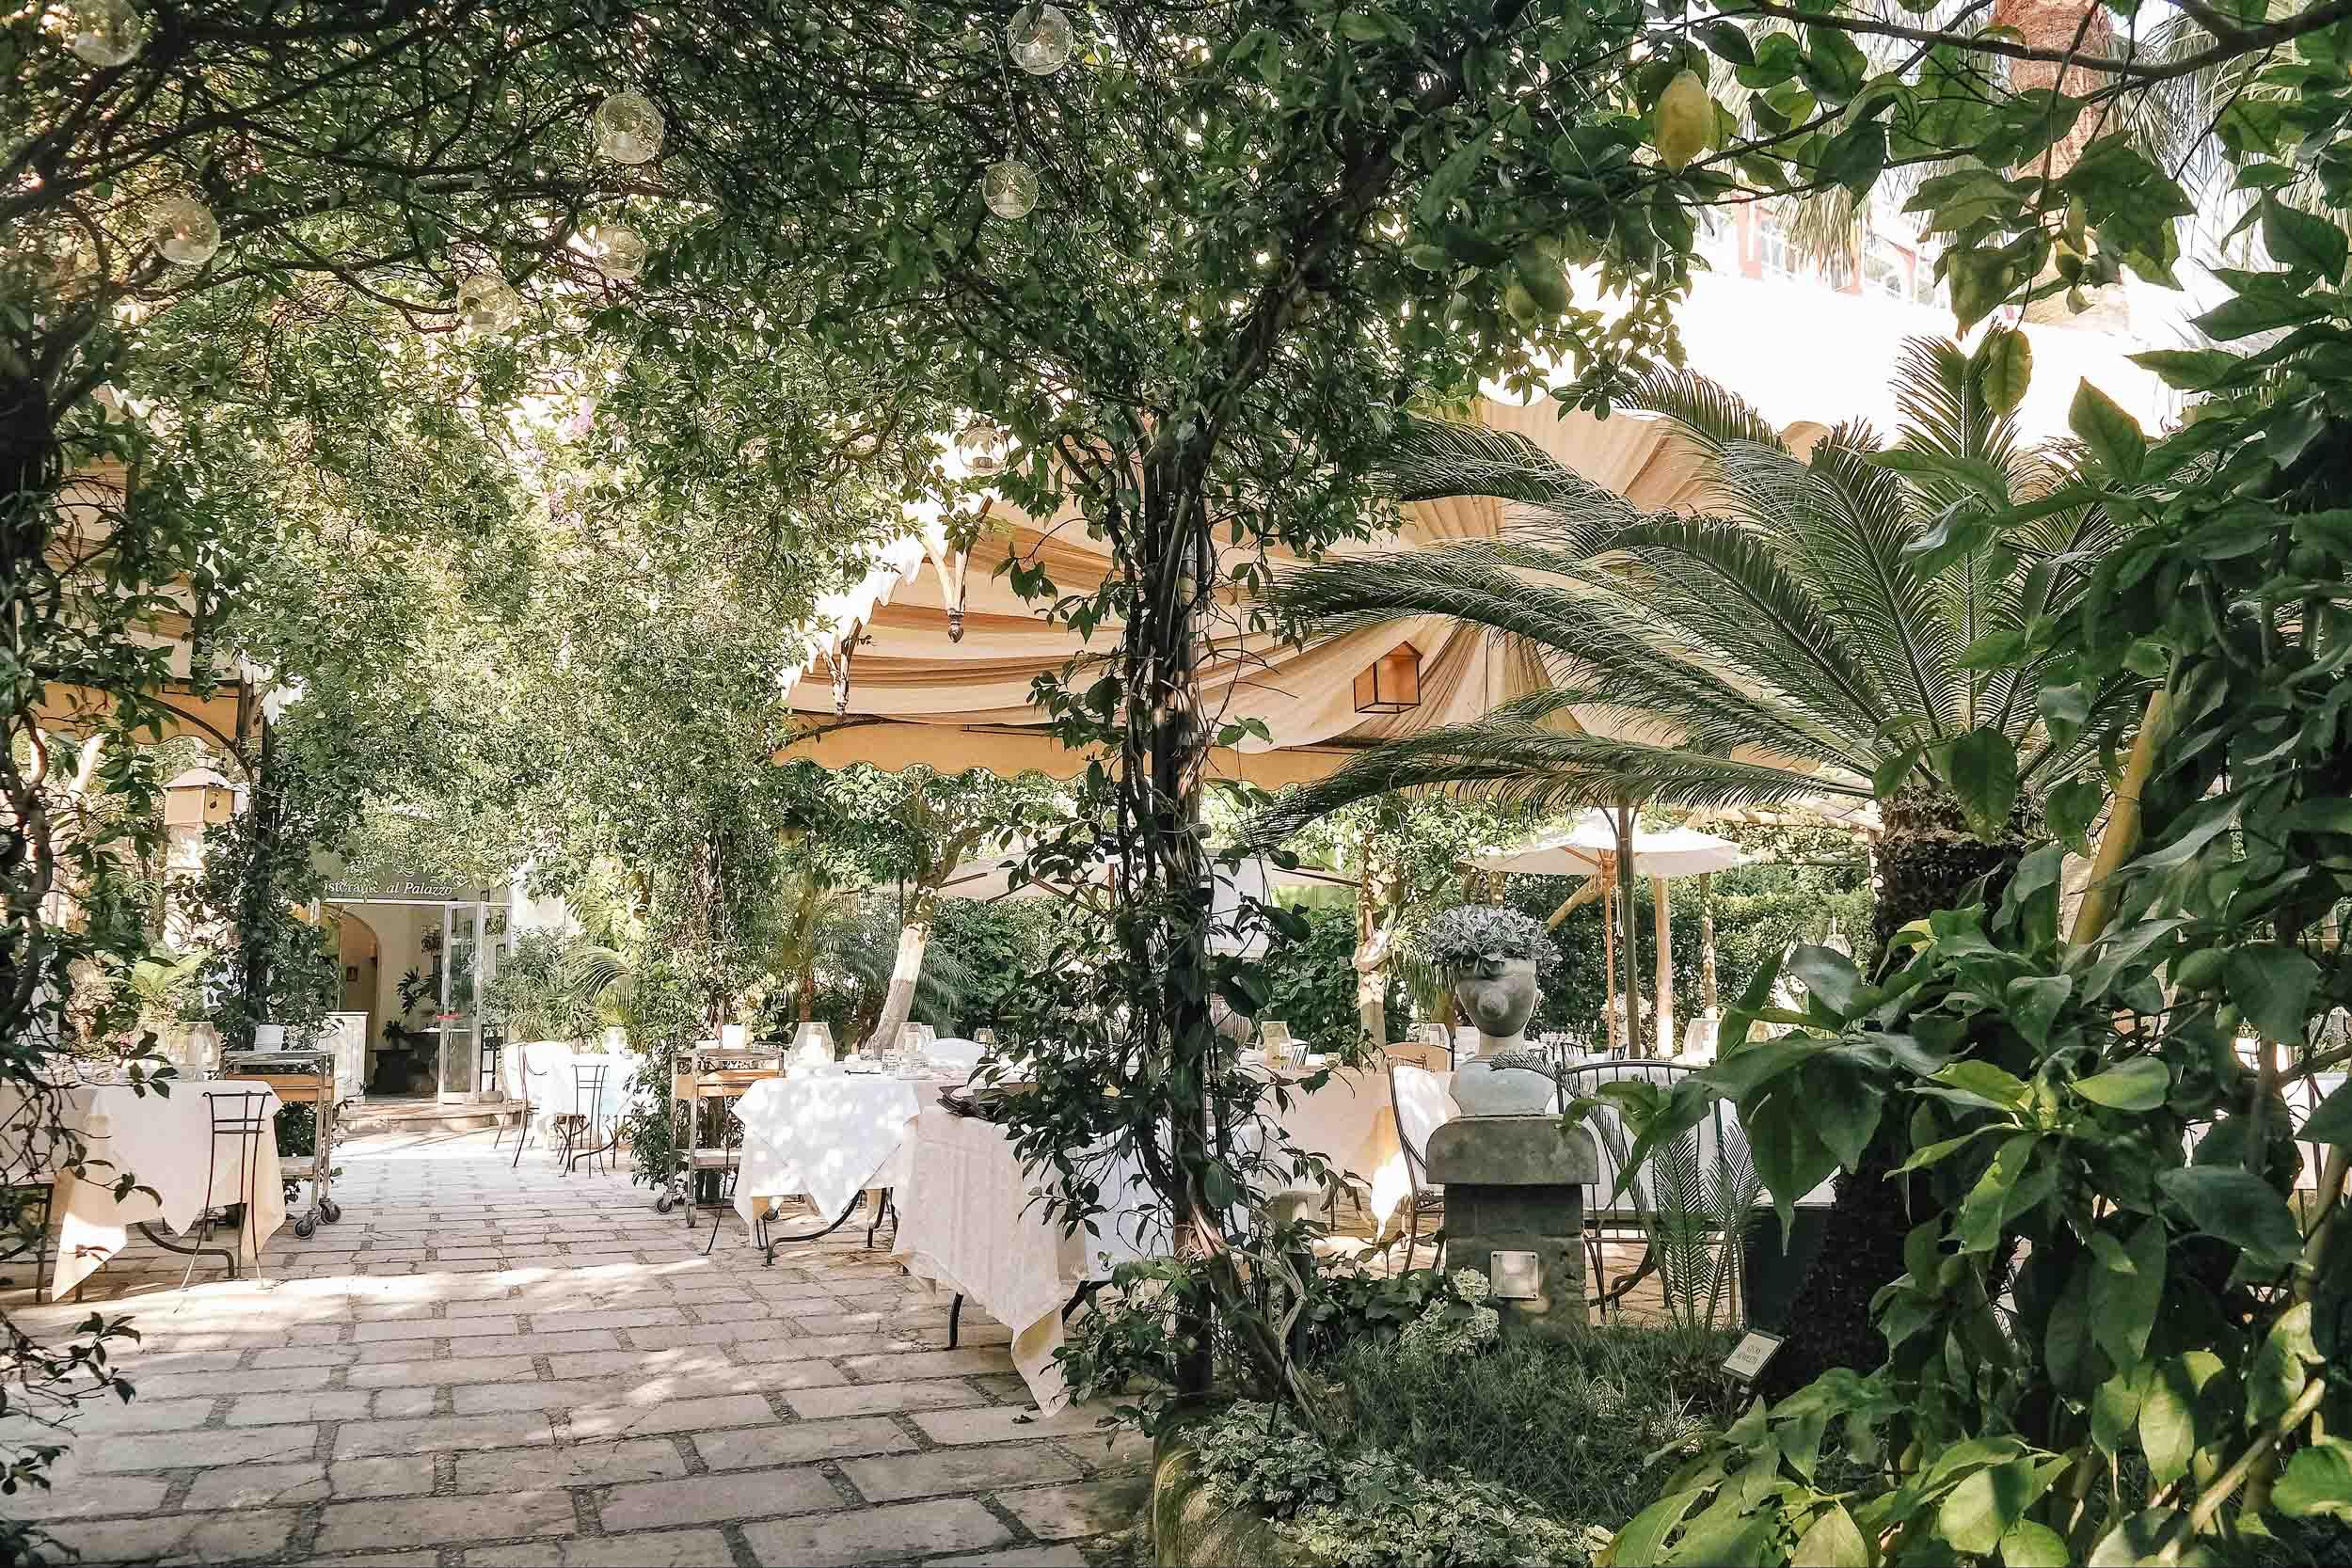 A restaurant patio in Positano, Italy